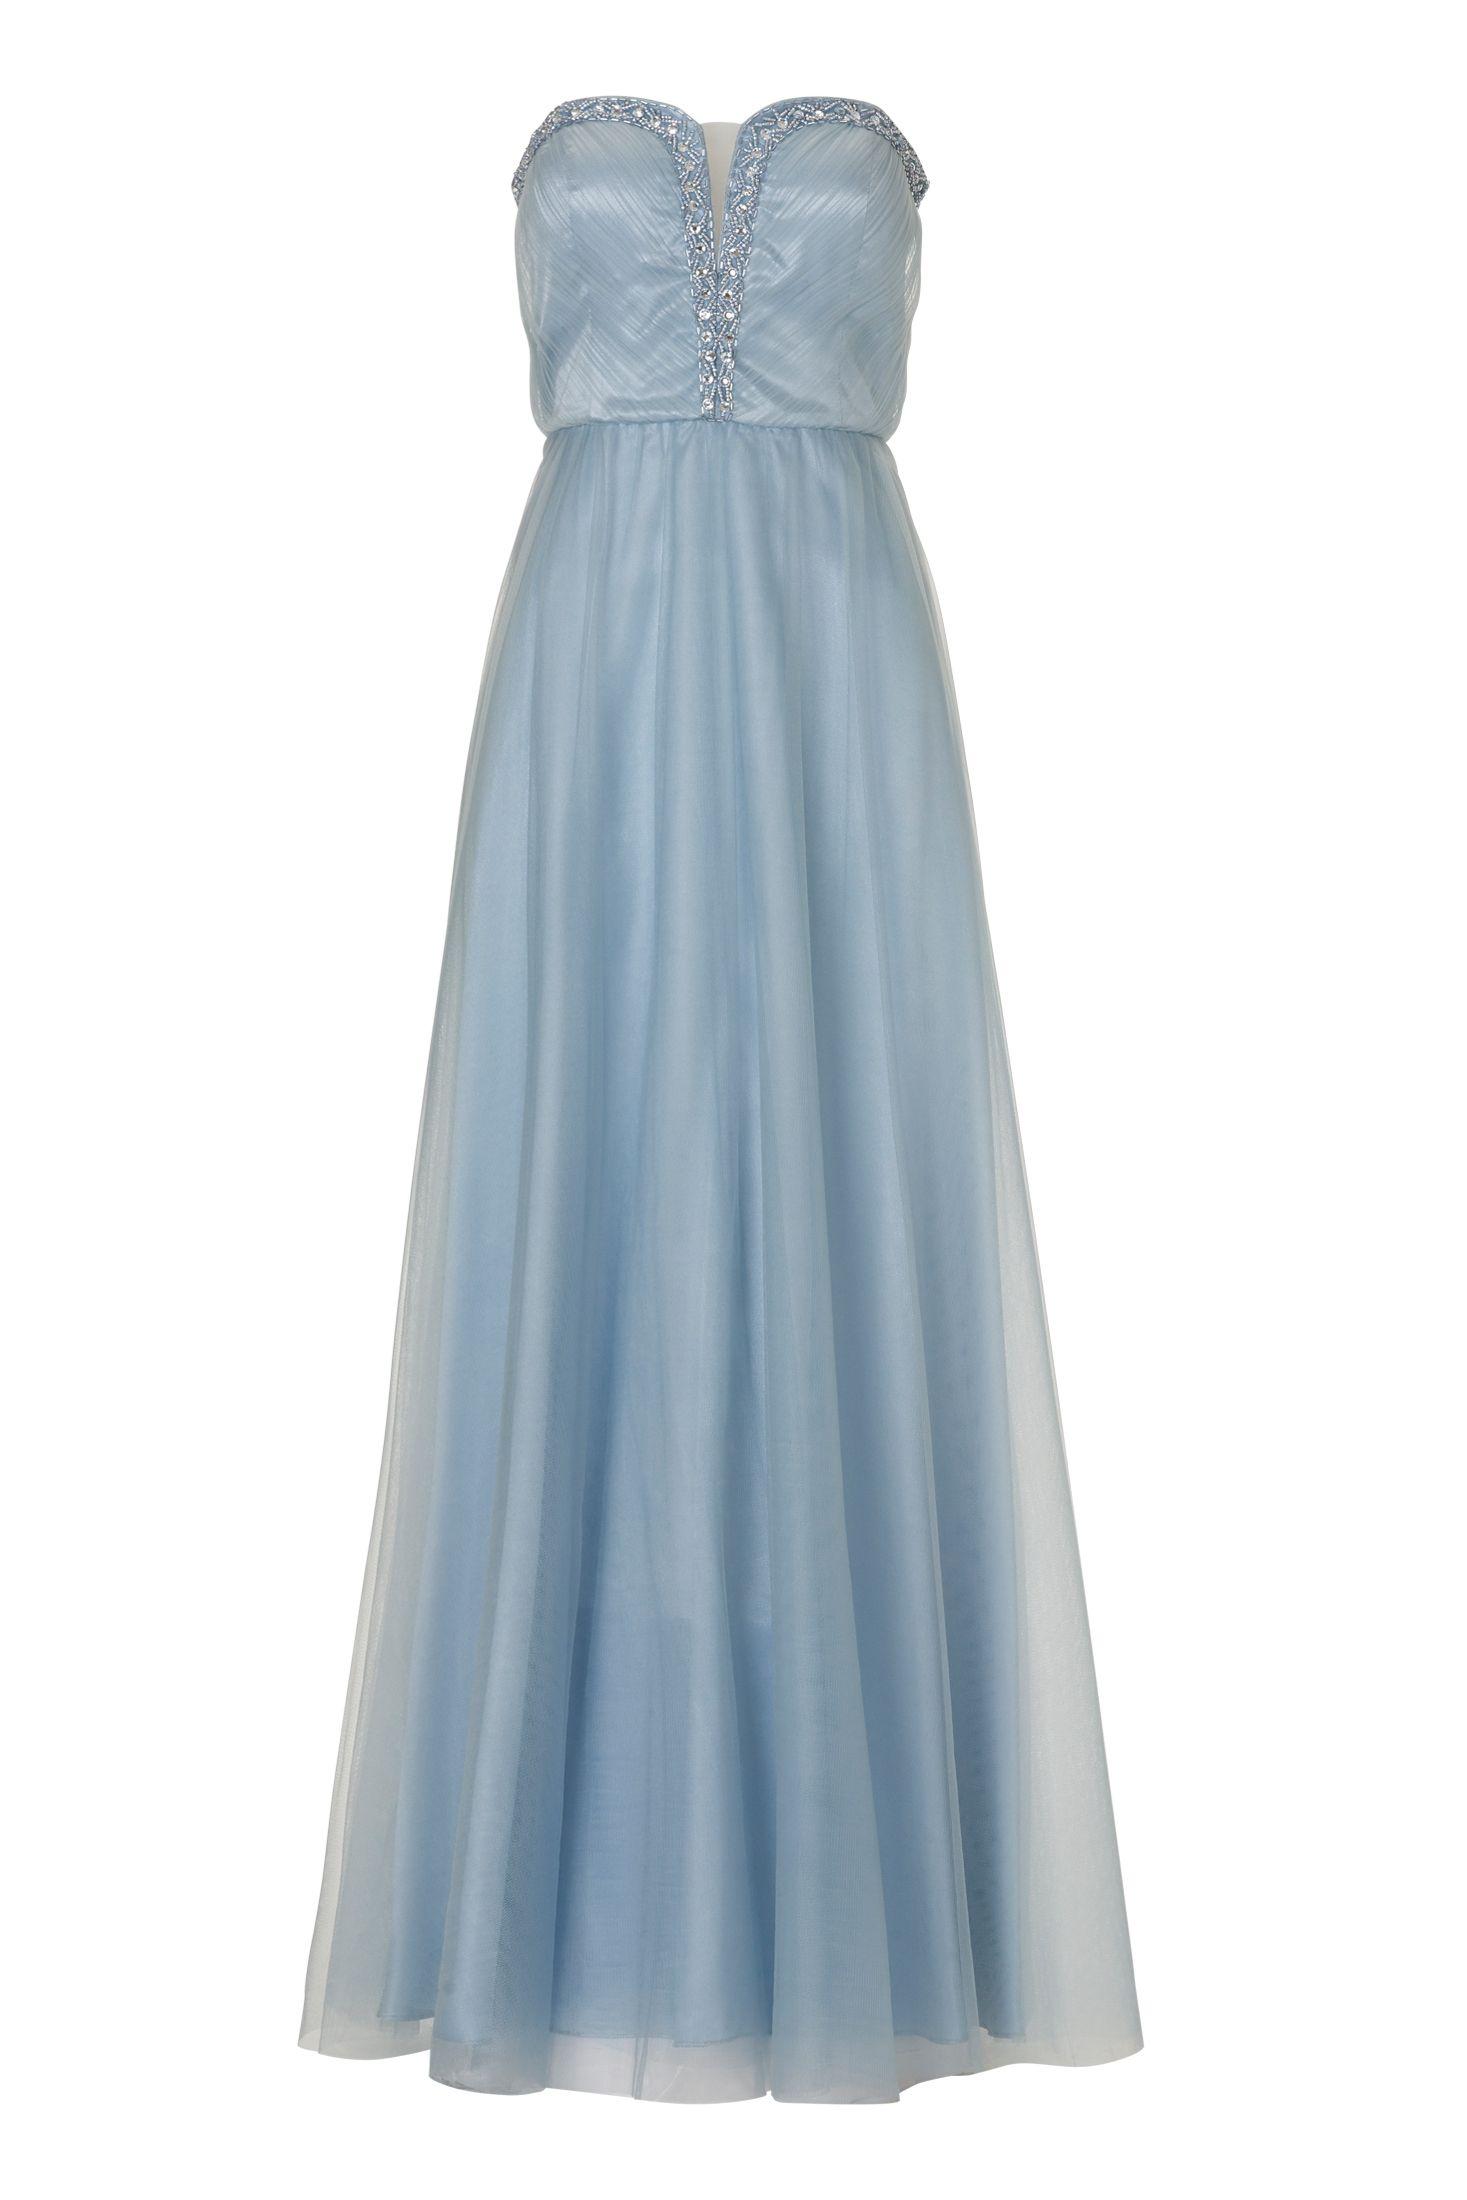 Abendkleider Langes #abendkleider #langes:separator:  Abendkleid